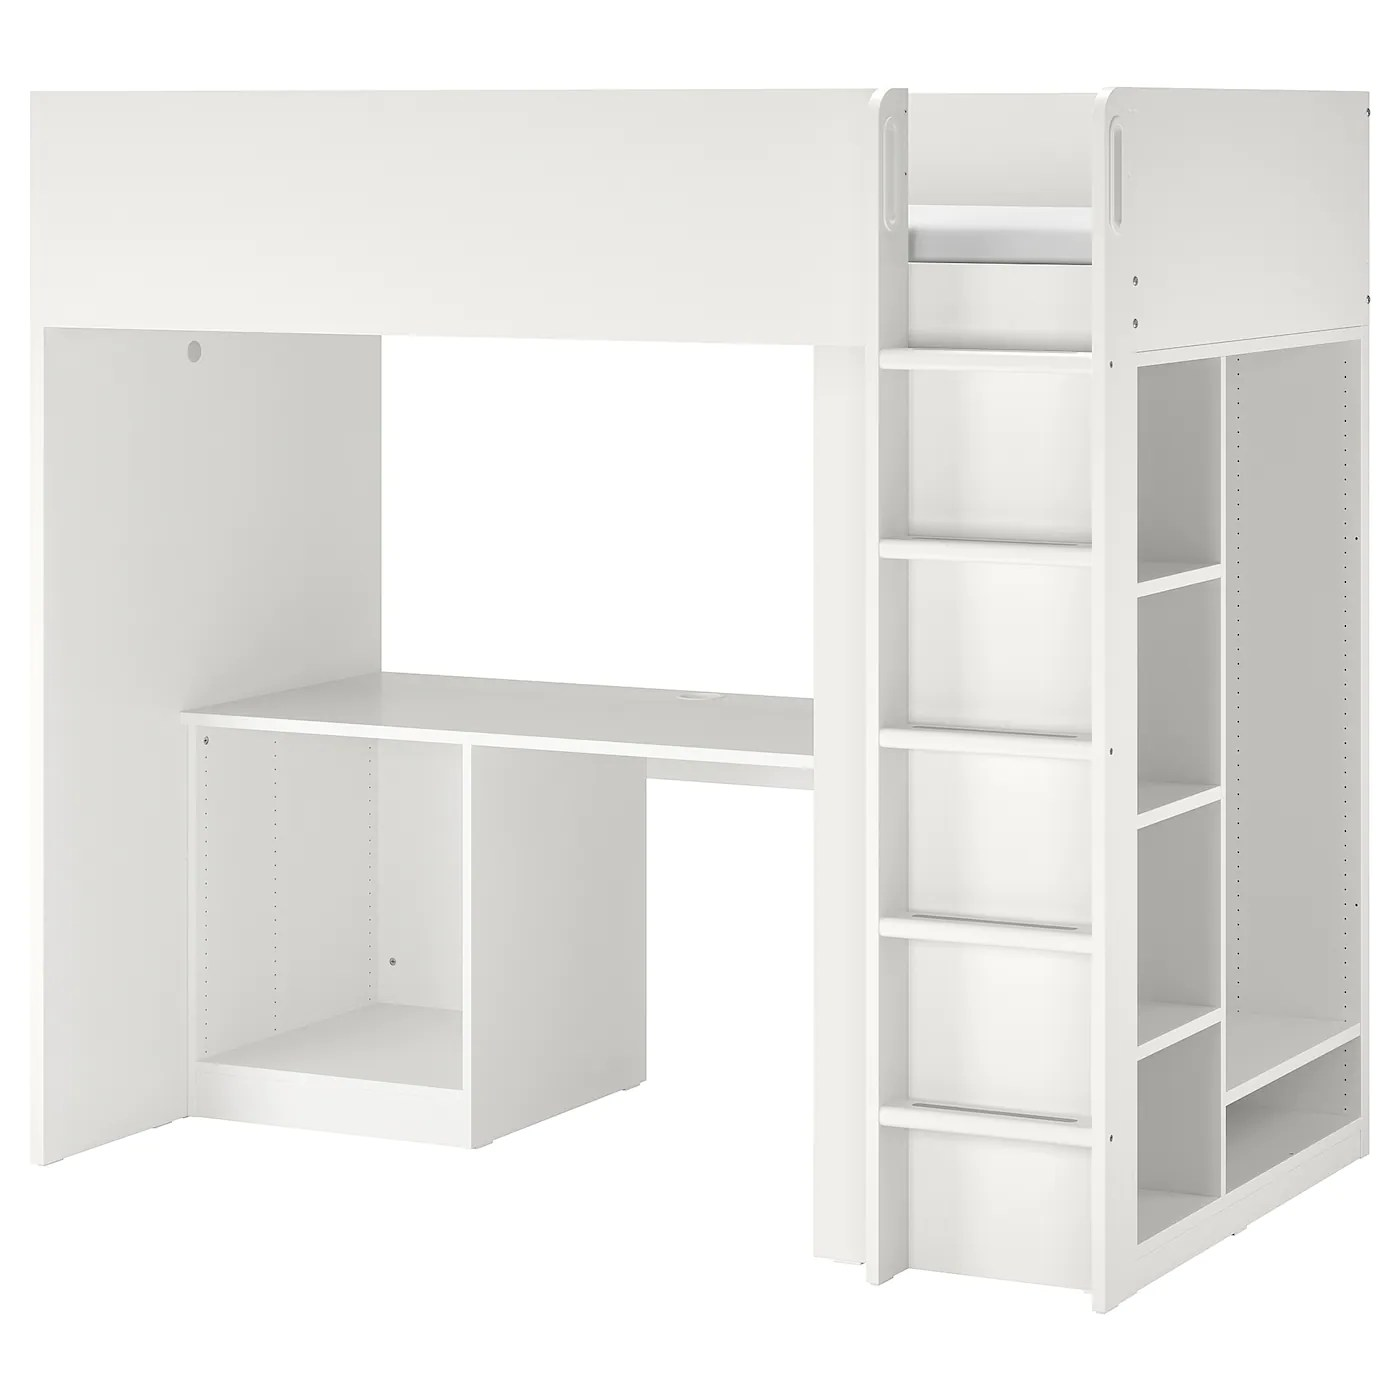 smastad loft bed frame w desk and storage white 90x200 cm